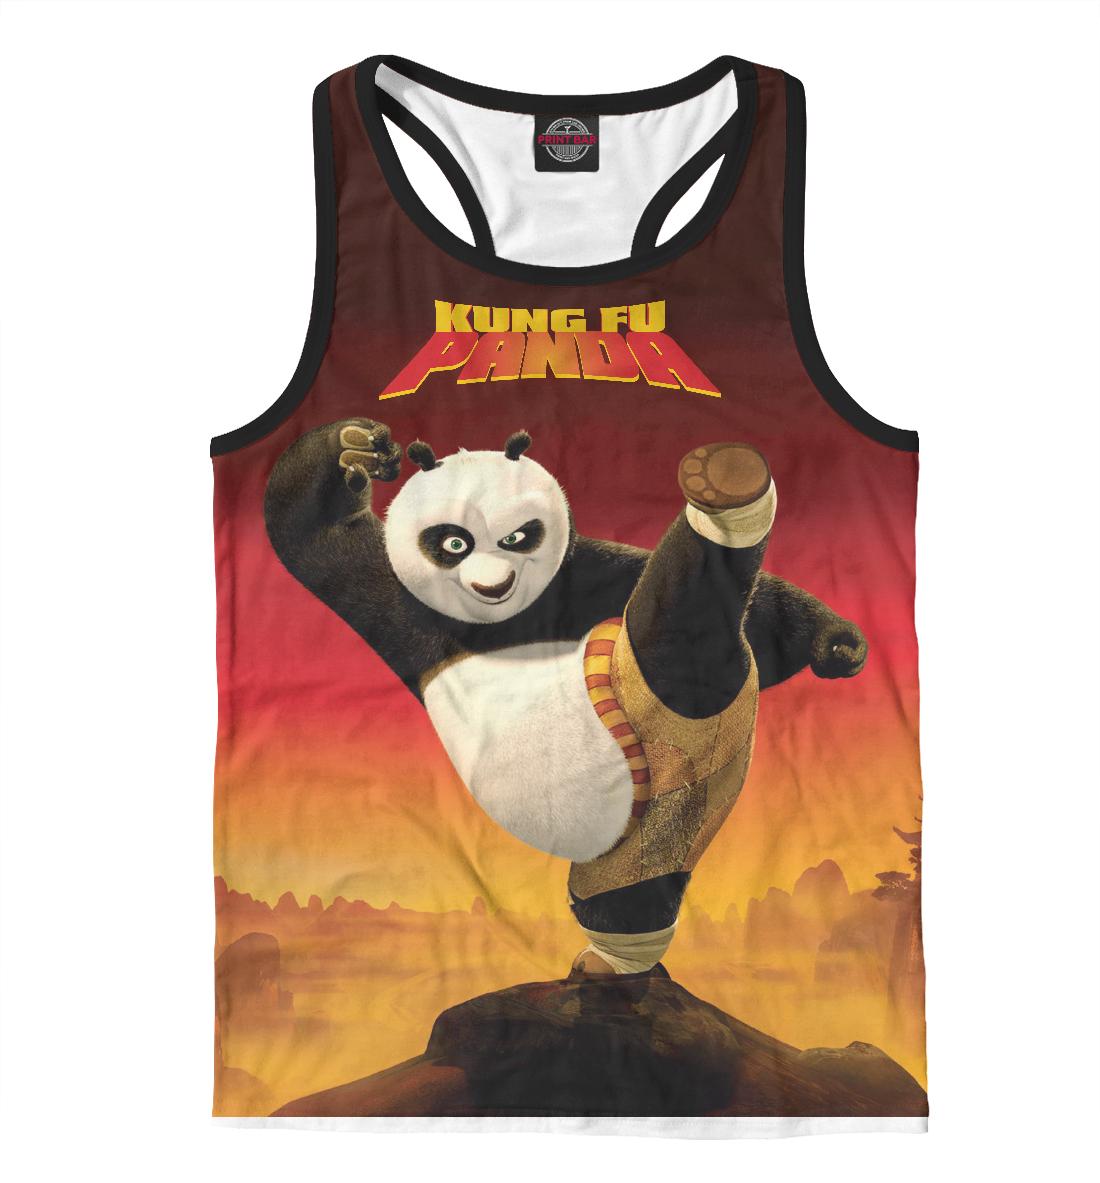 Купить Kung Fu Panda, Printbar, Майки борцовки, MFR-892946-mayb-2